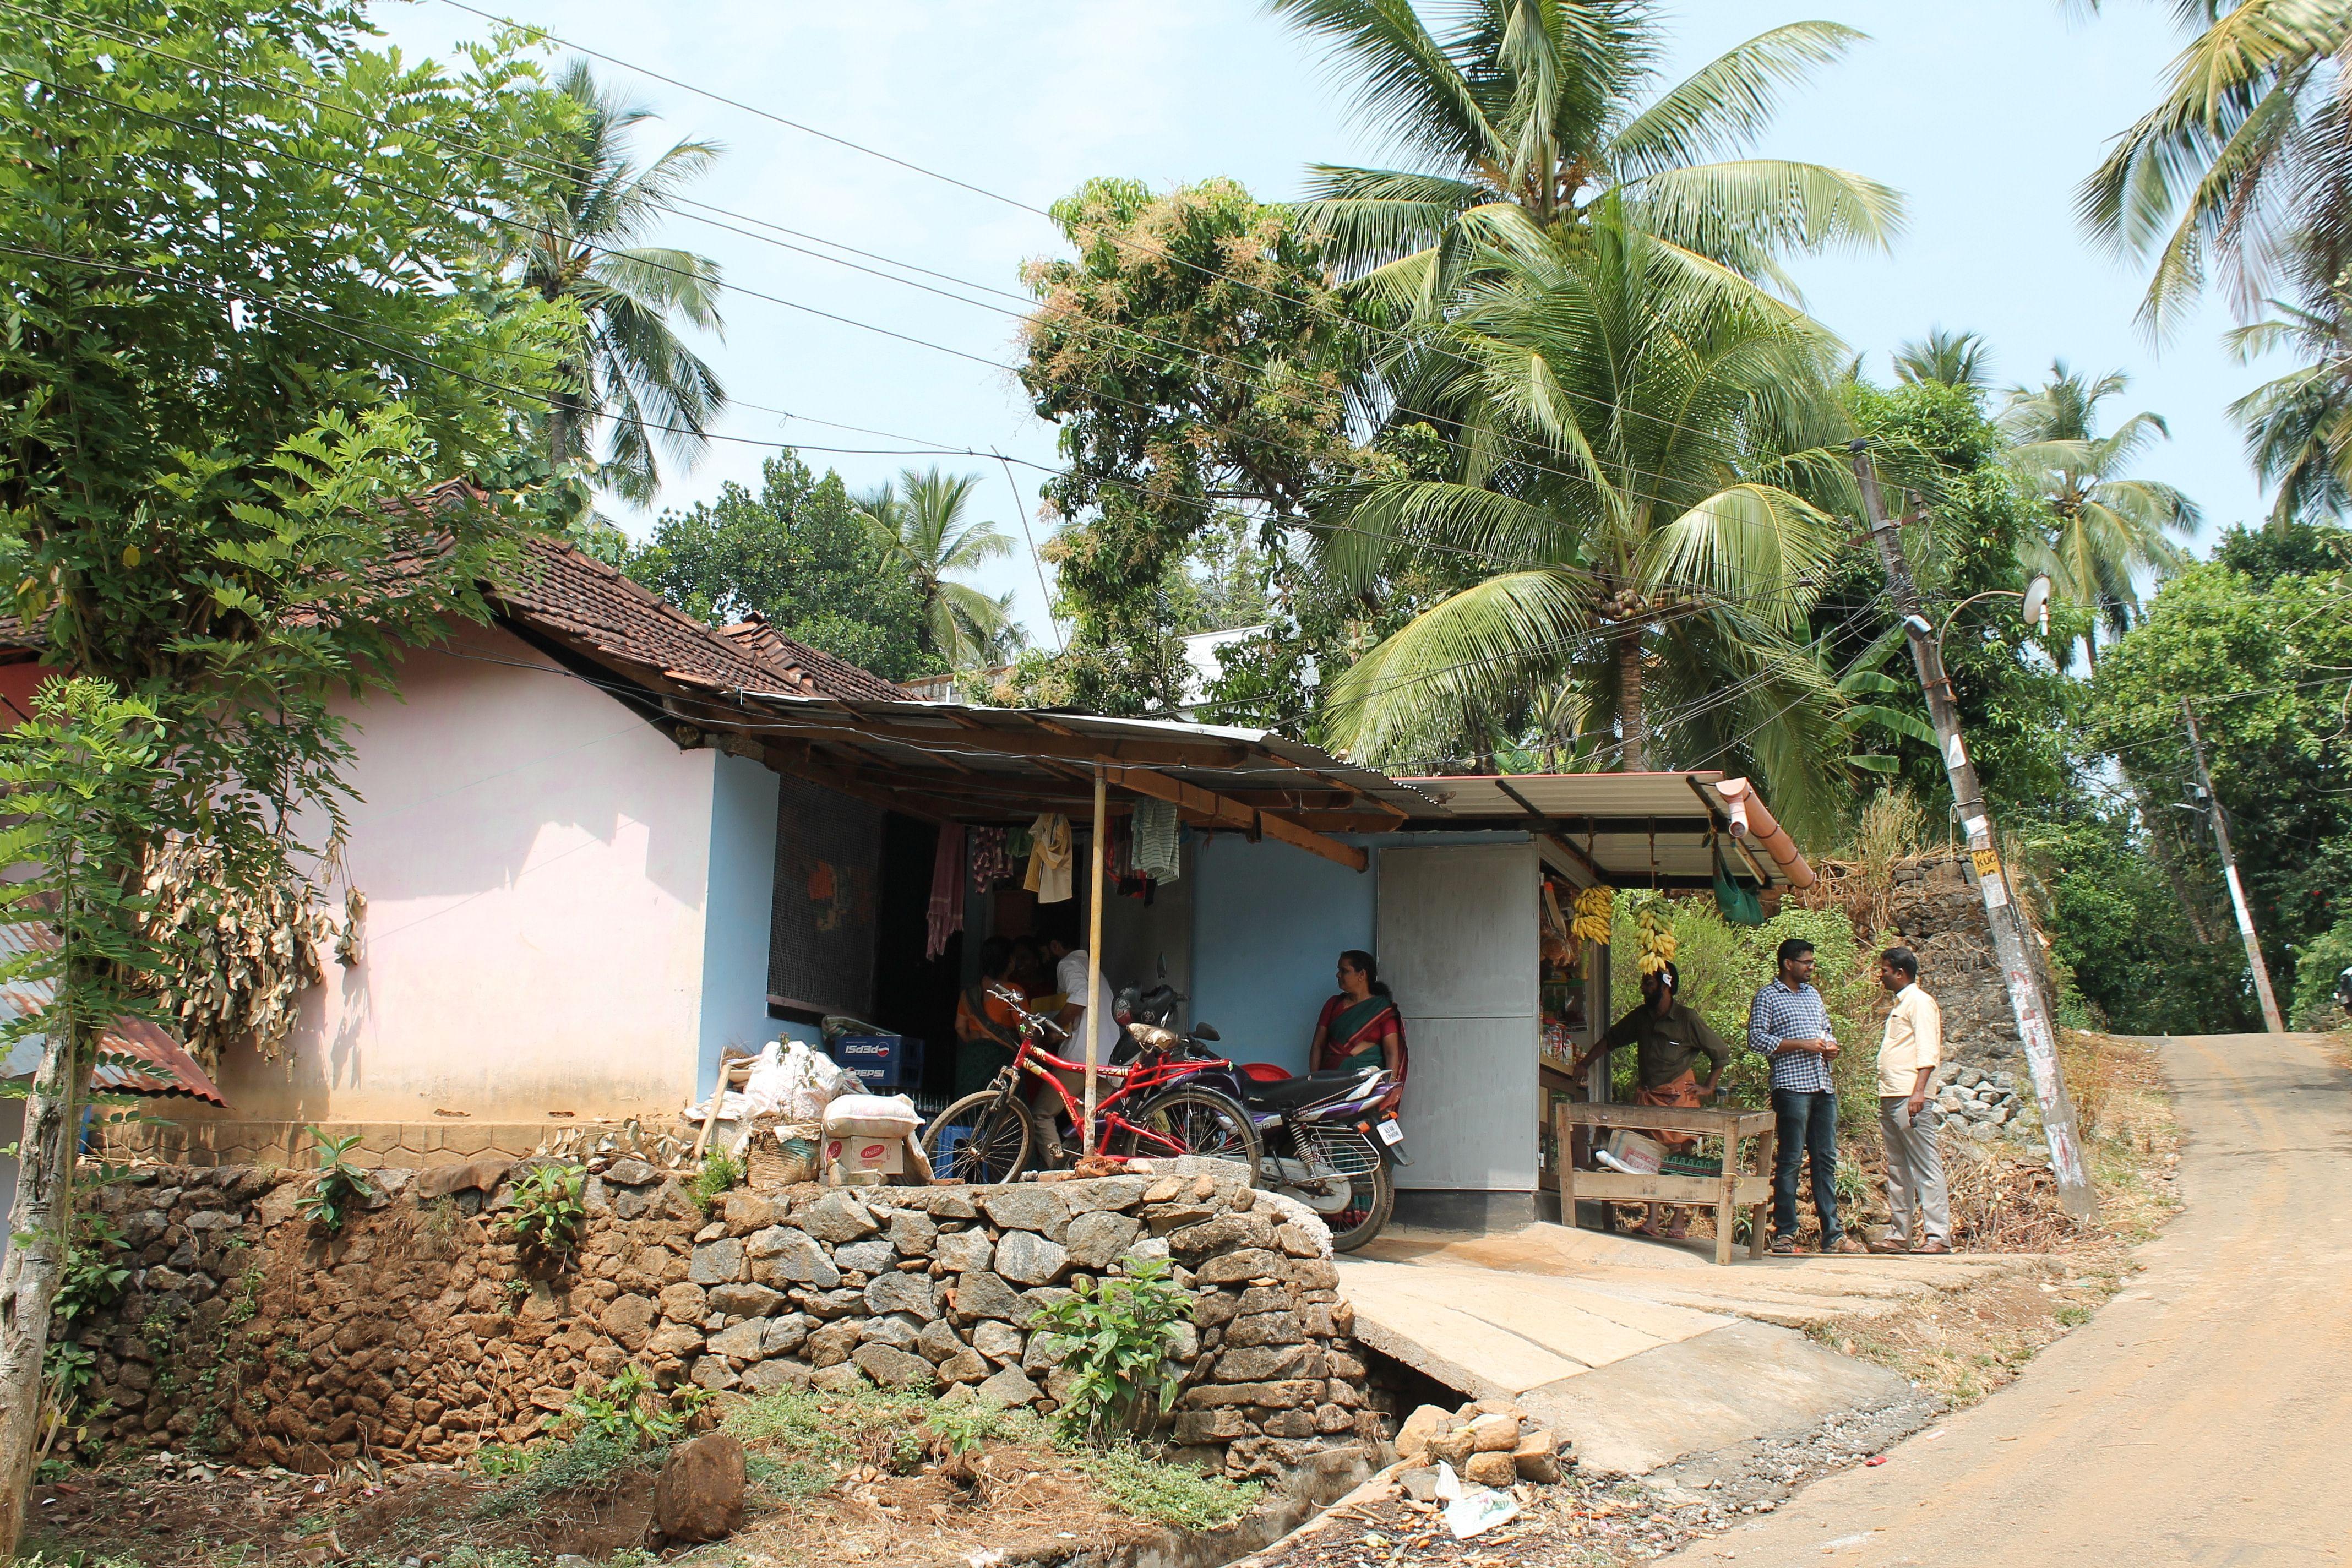 Tailoring unit, livelihood, woman of substance, children, education